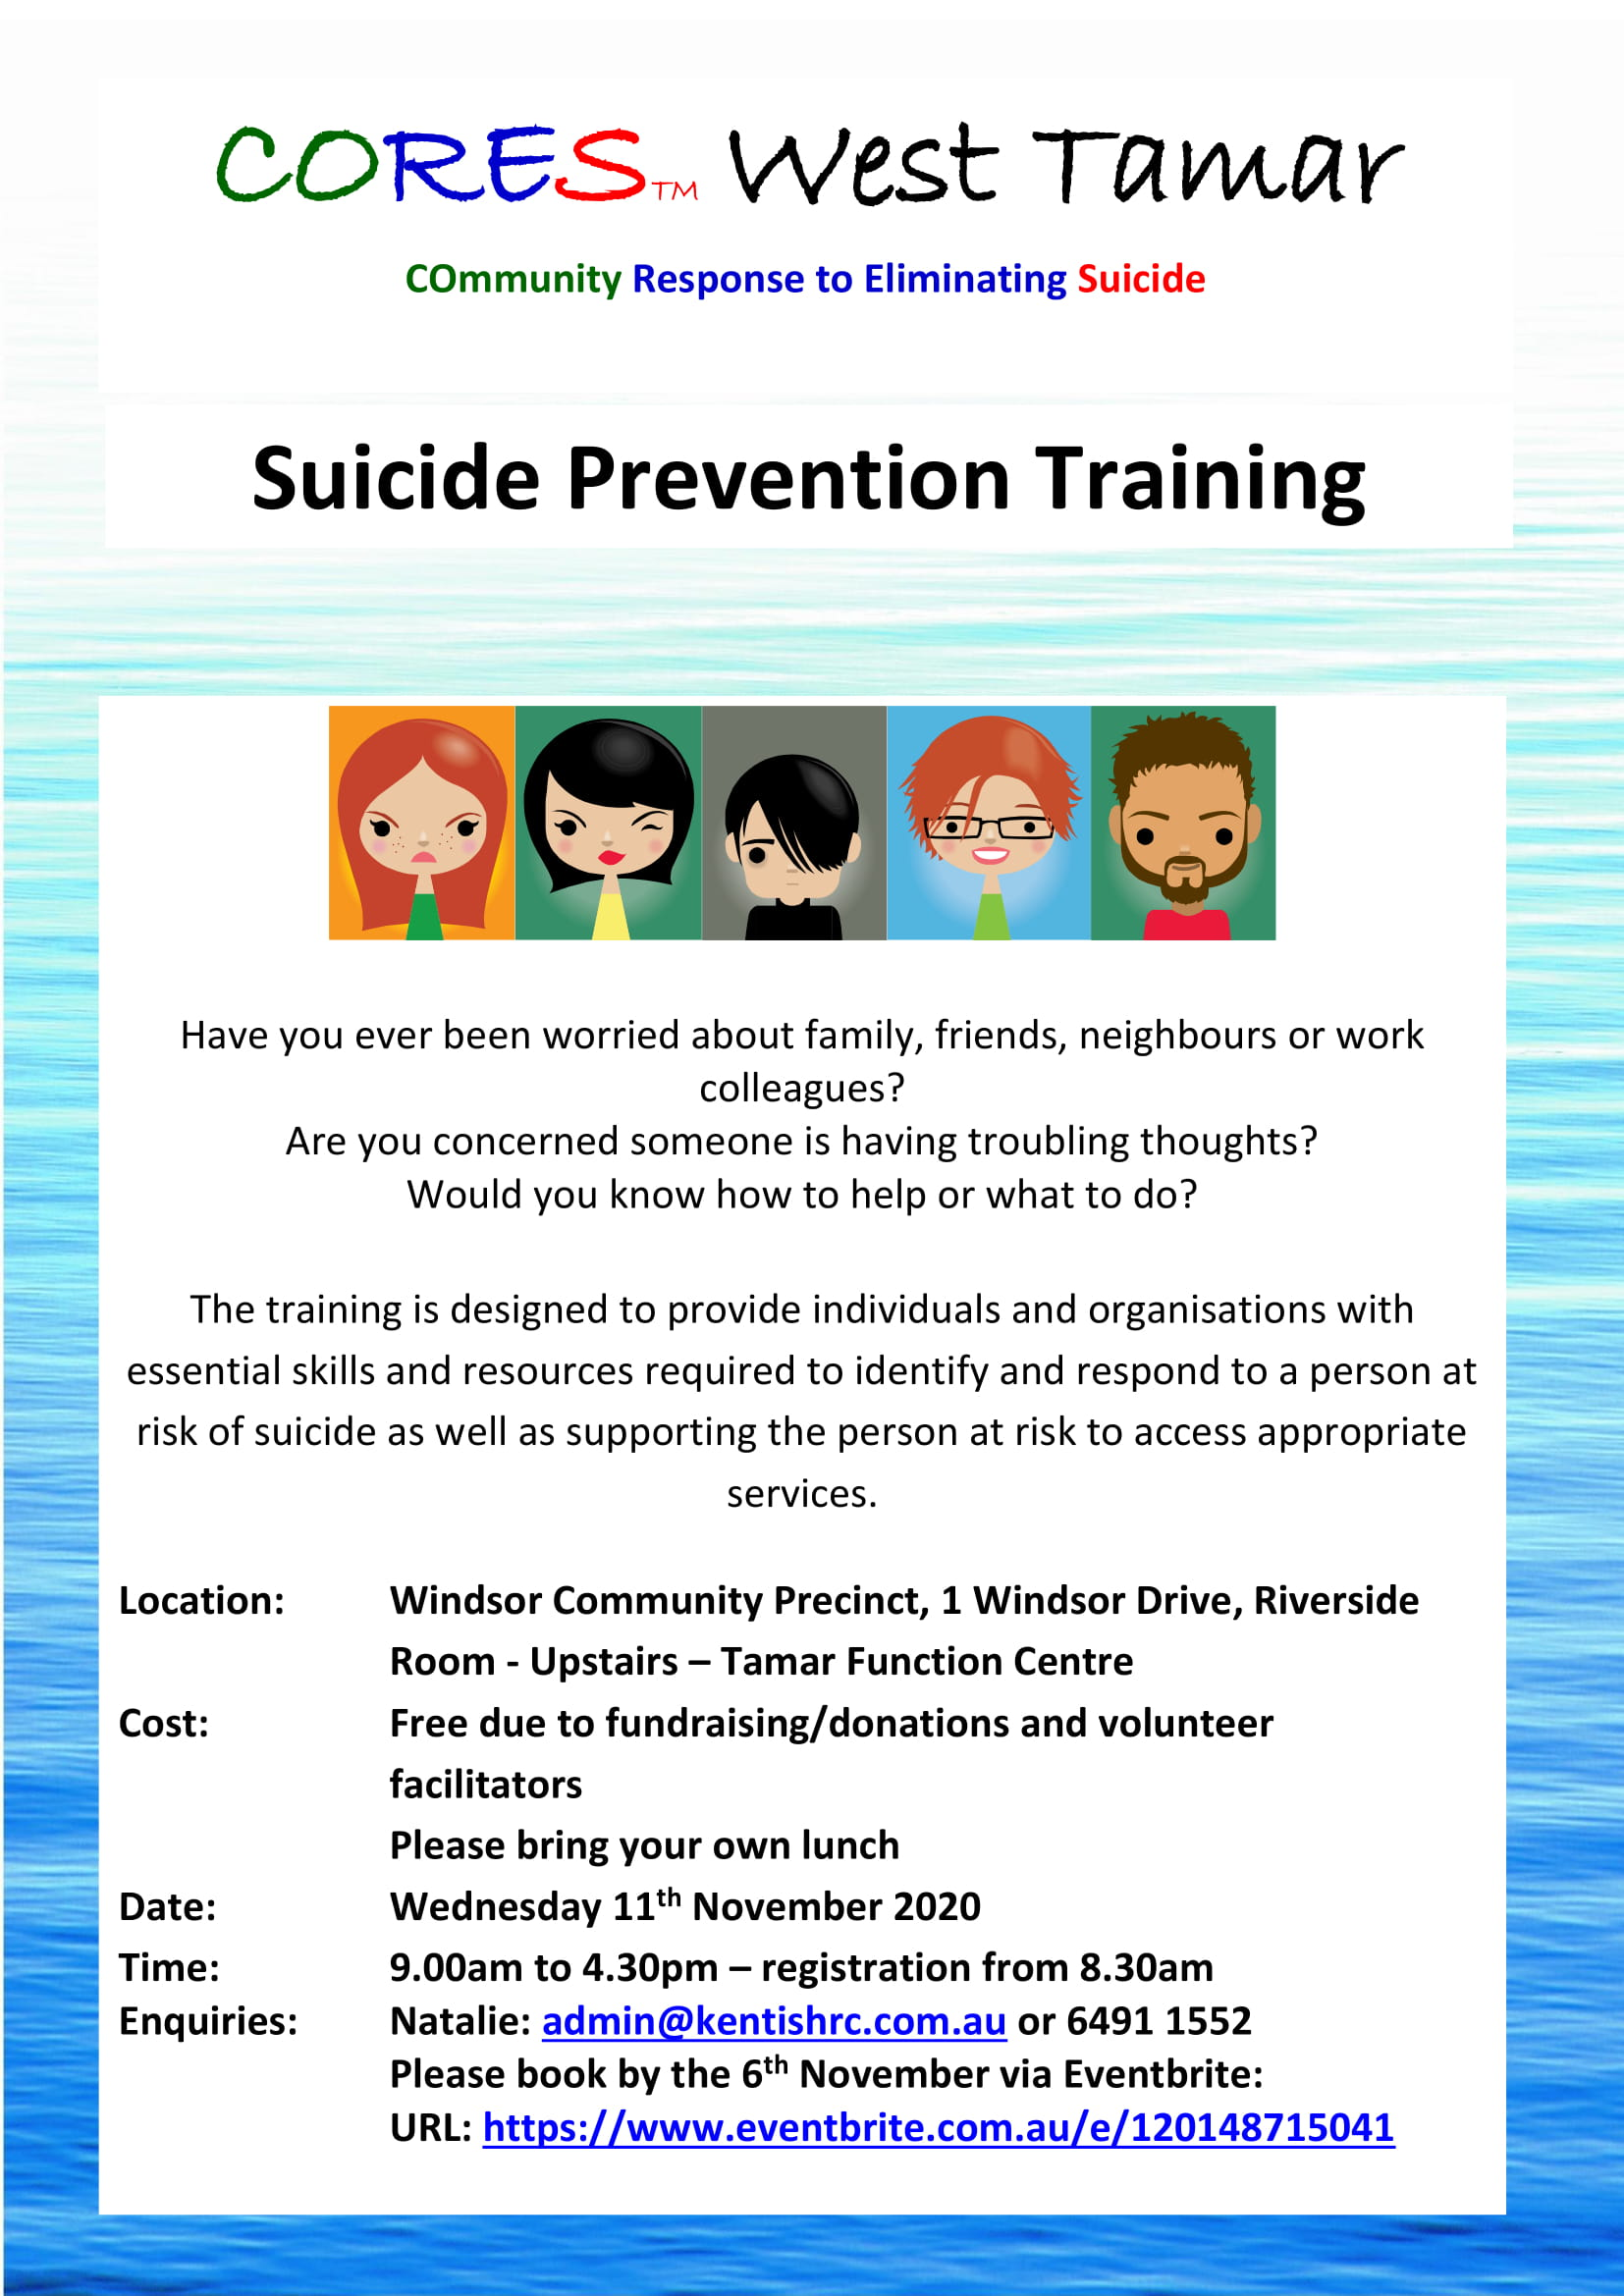 CORES training Riverside November 2020 fb